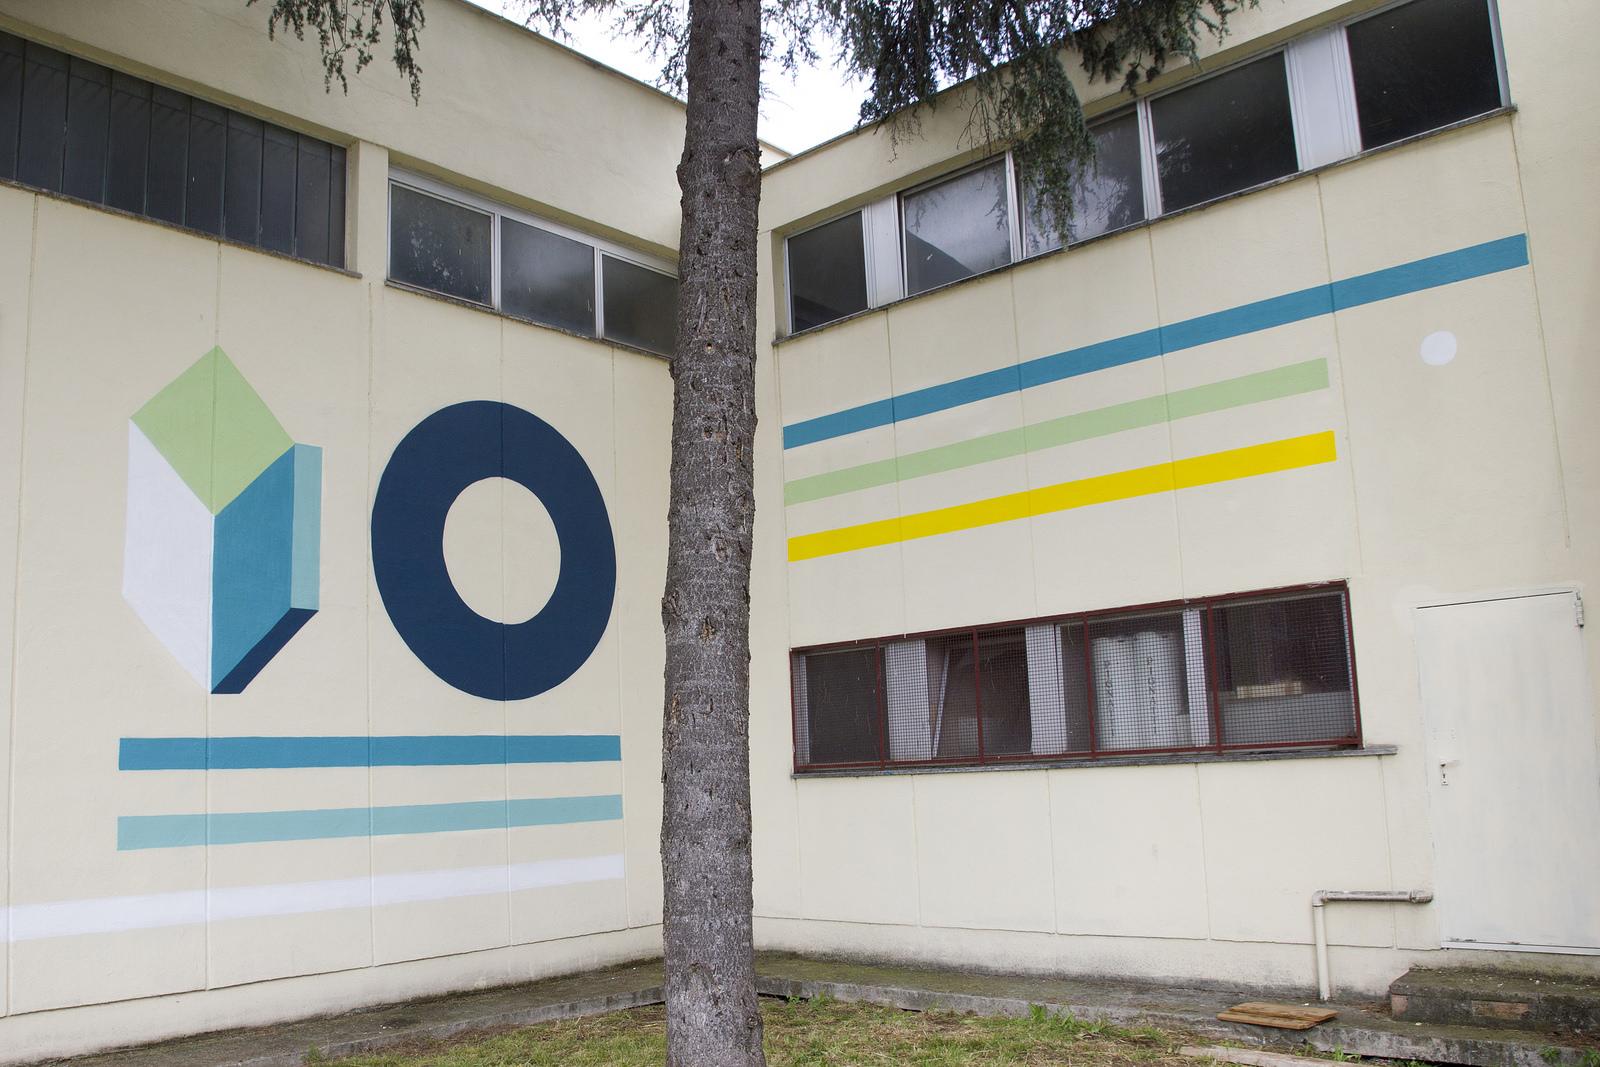 nelio-new-murals-for-memorie-urbane-festival-2014-01